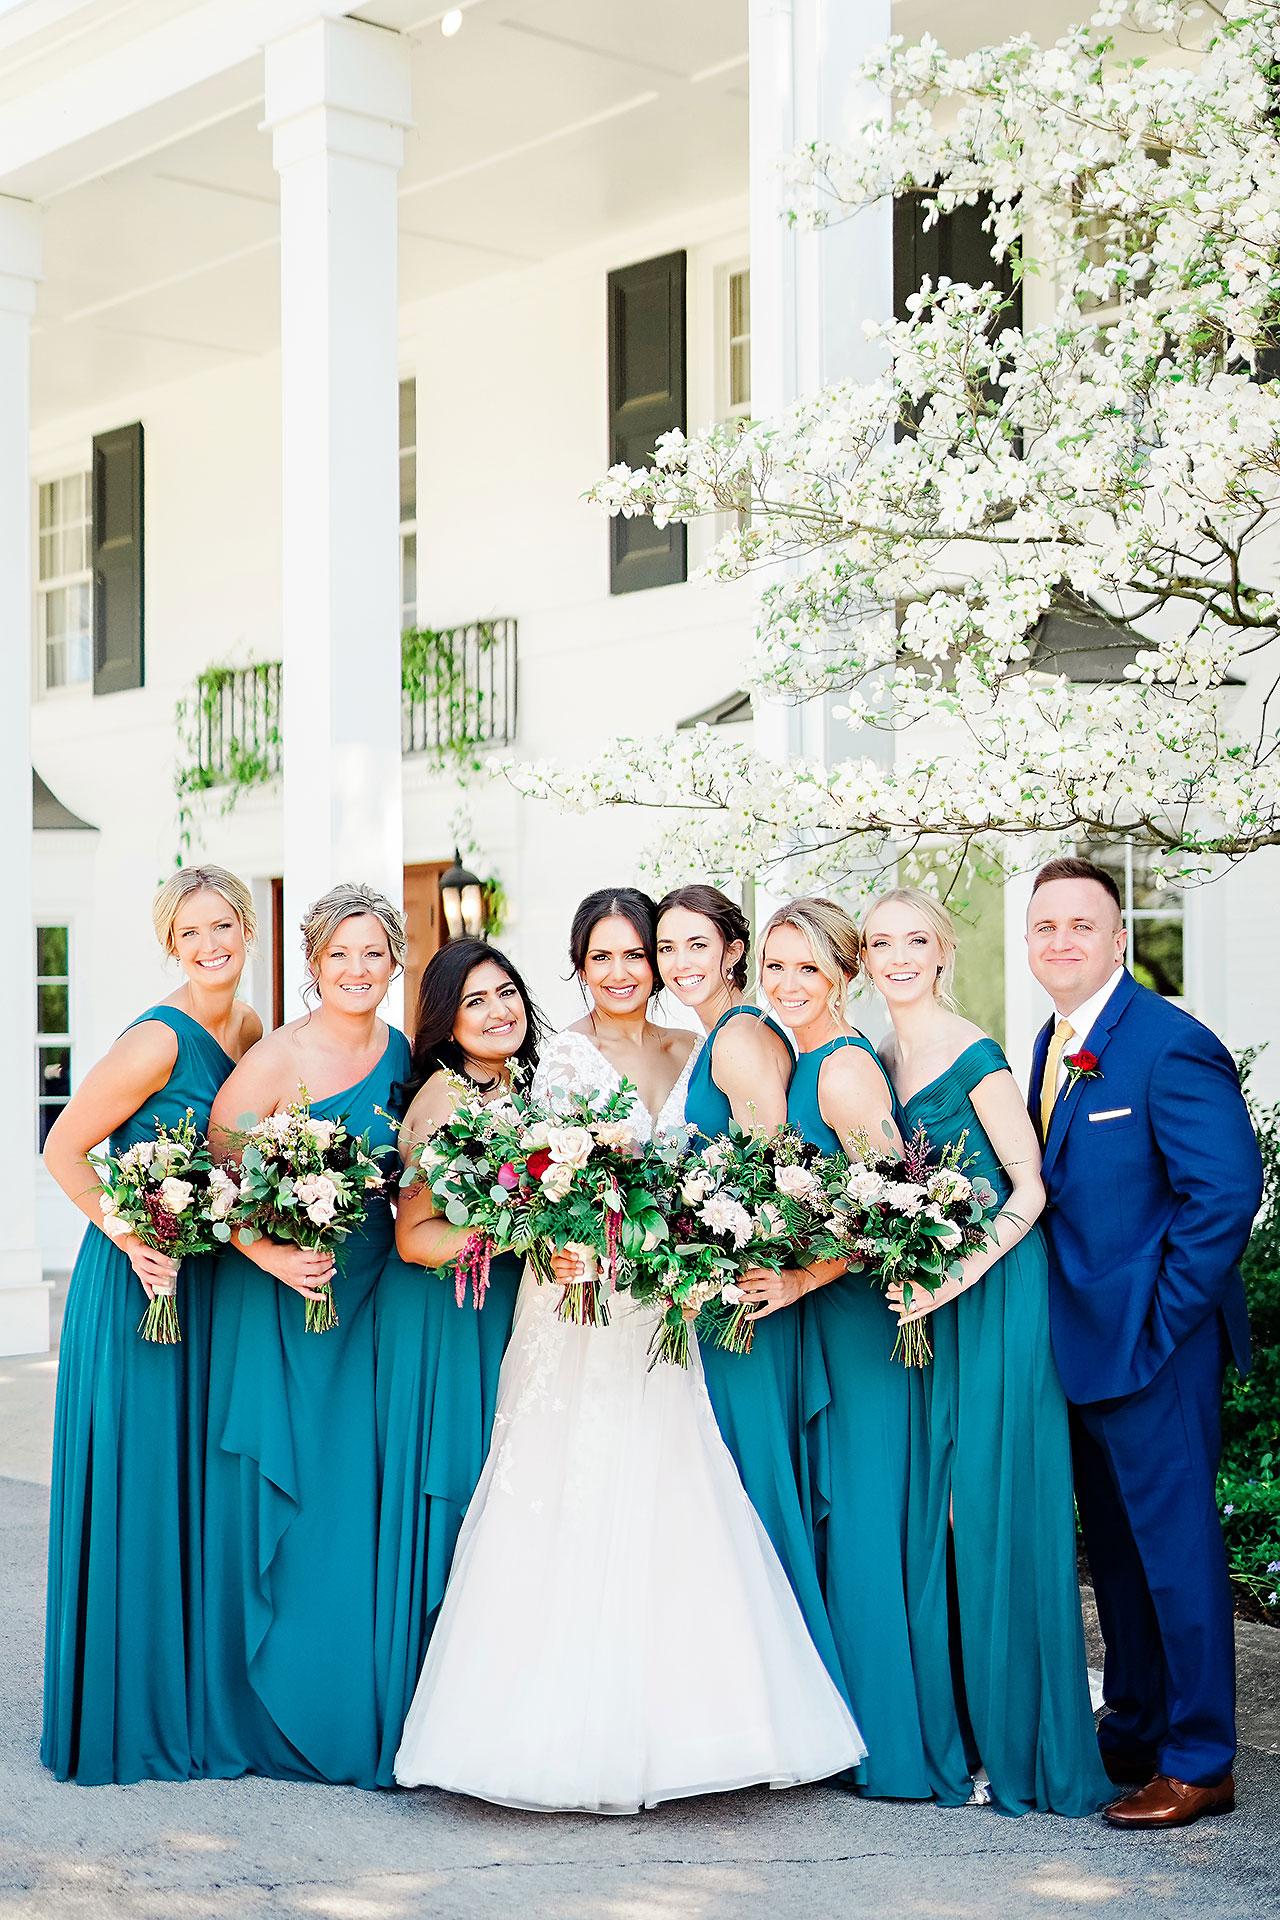 Nadia Parker Black Iris Estate Carmel Indiana Wedding May 2021 143